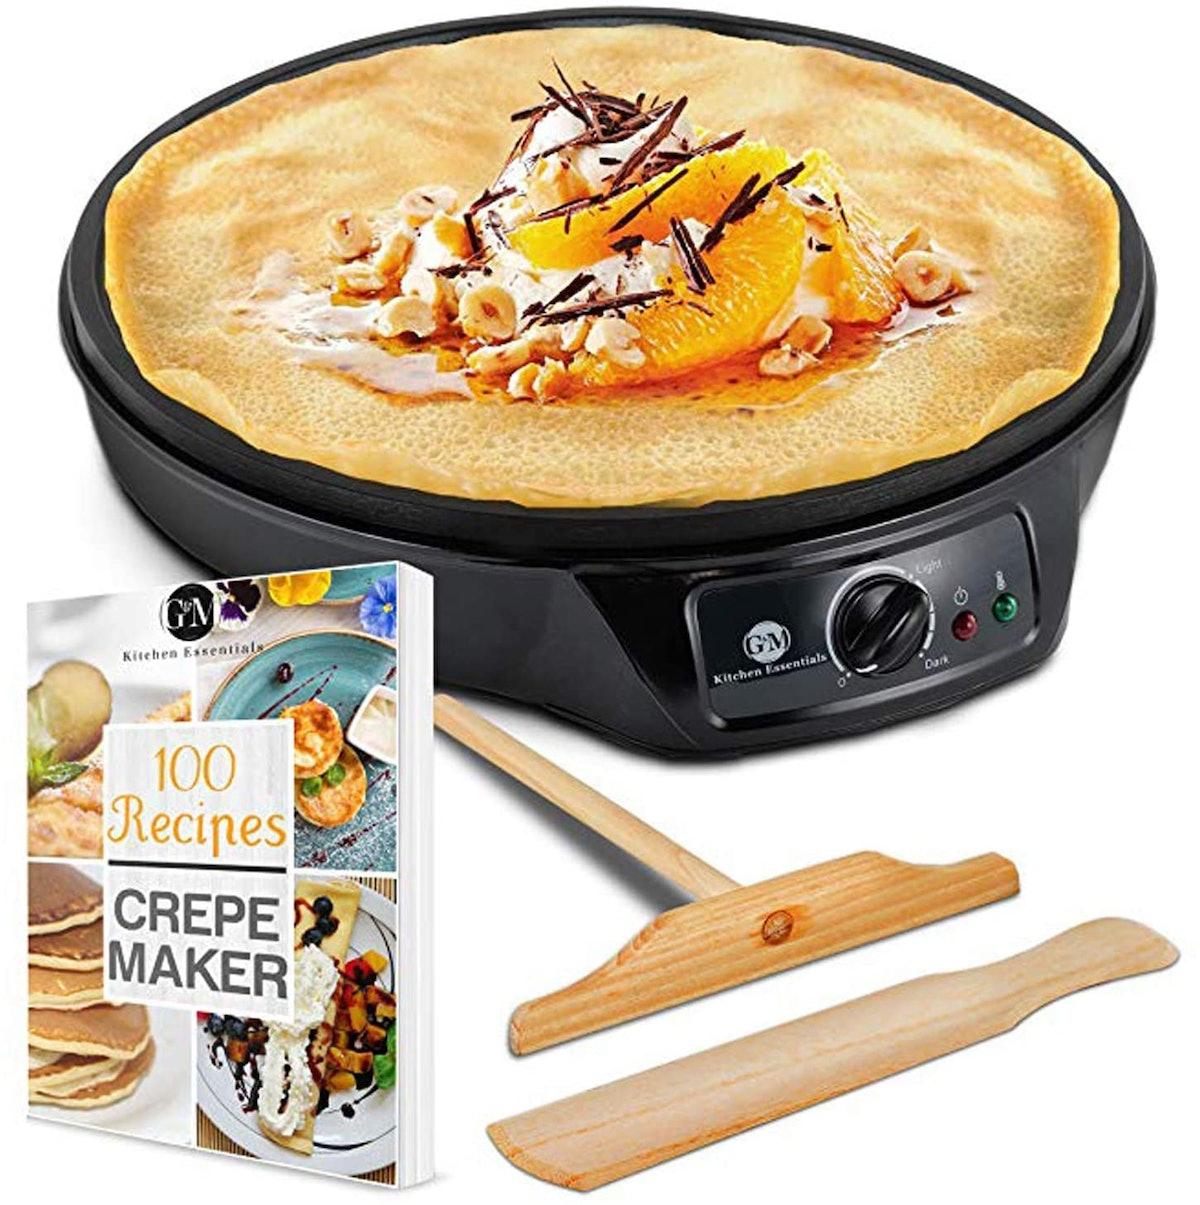 G&M Kitchen Essentials 12-Inch Crepe Maker with Batter Spreader, Wooden Spatula & Cookbook